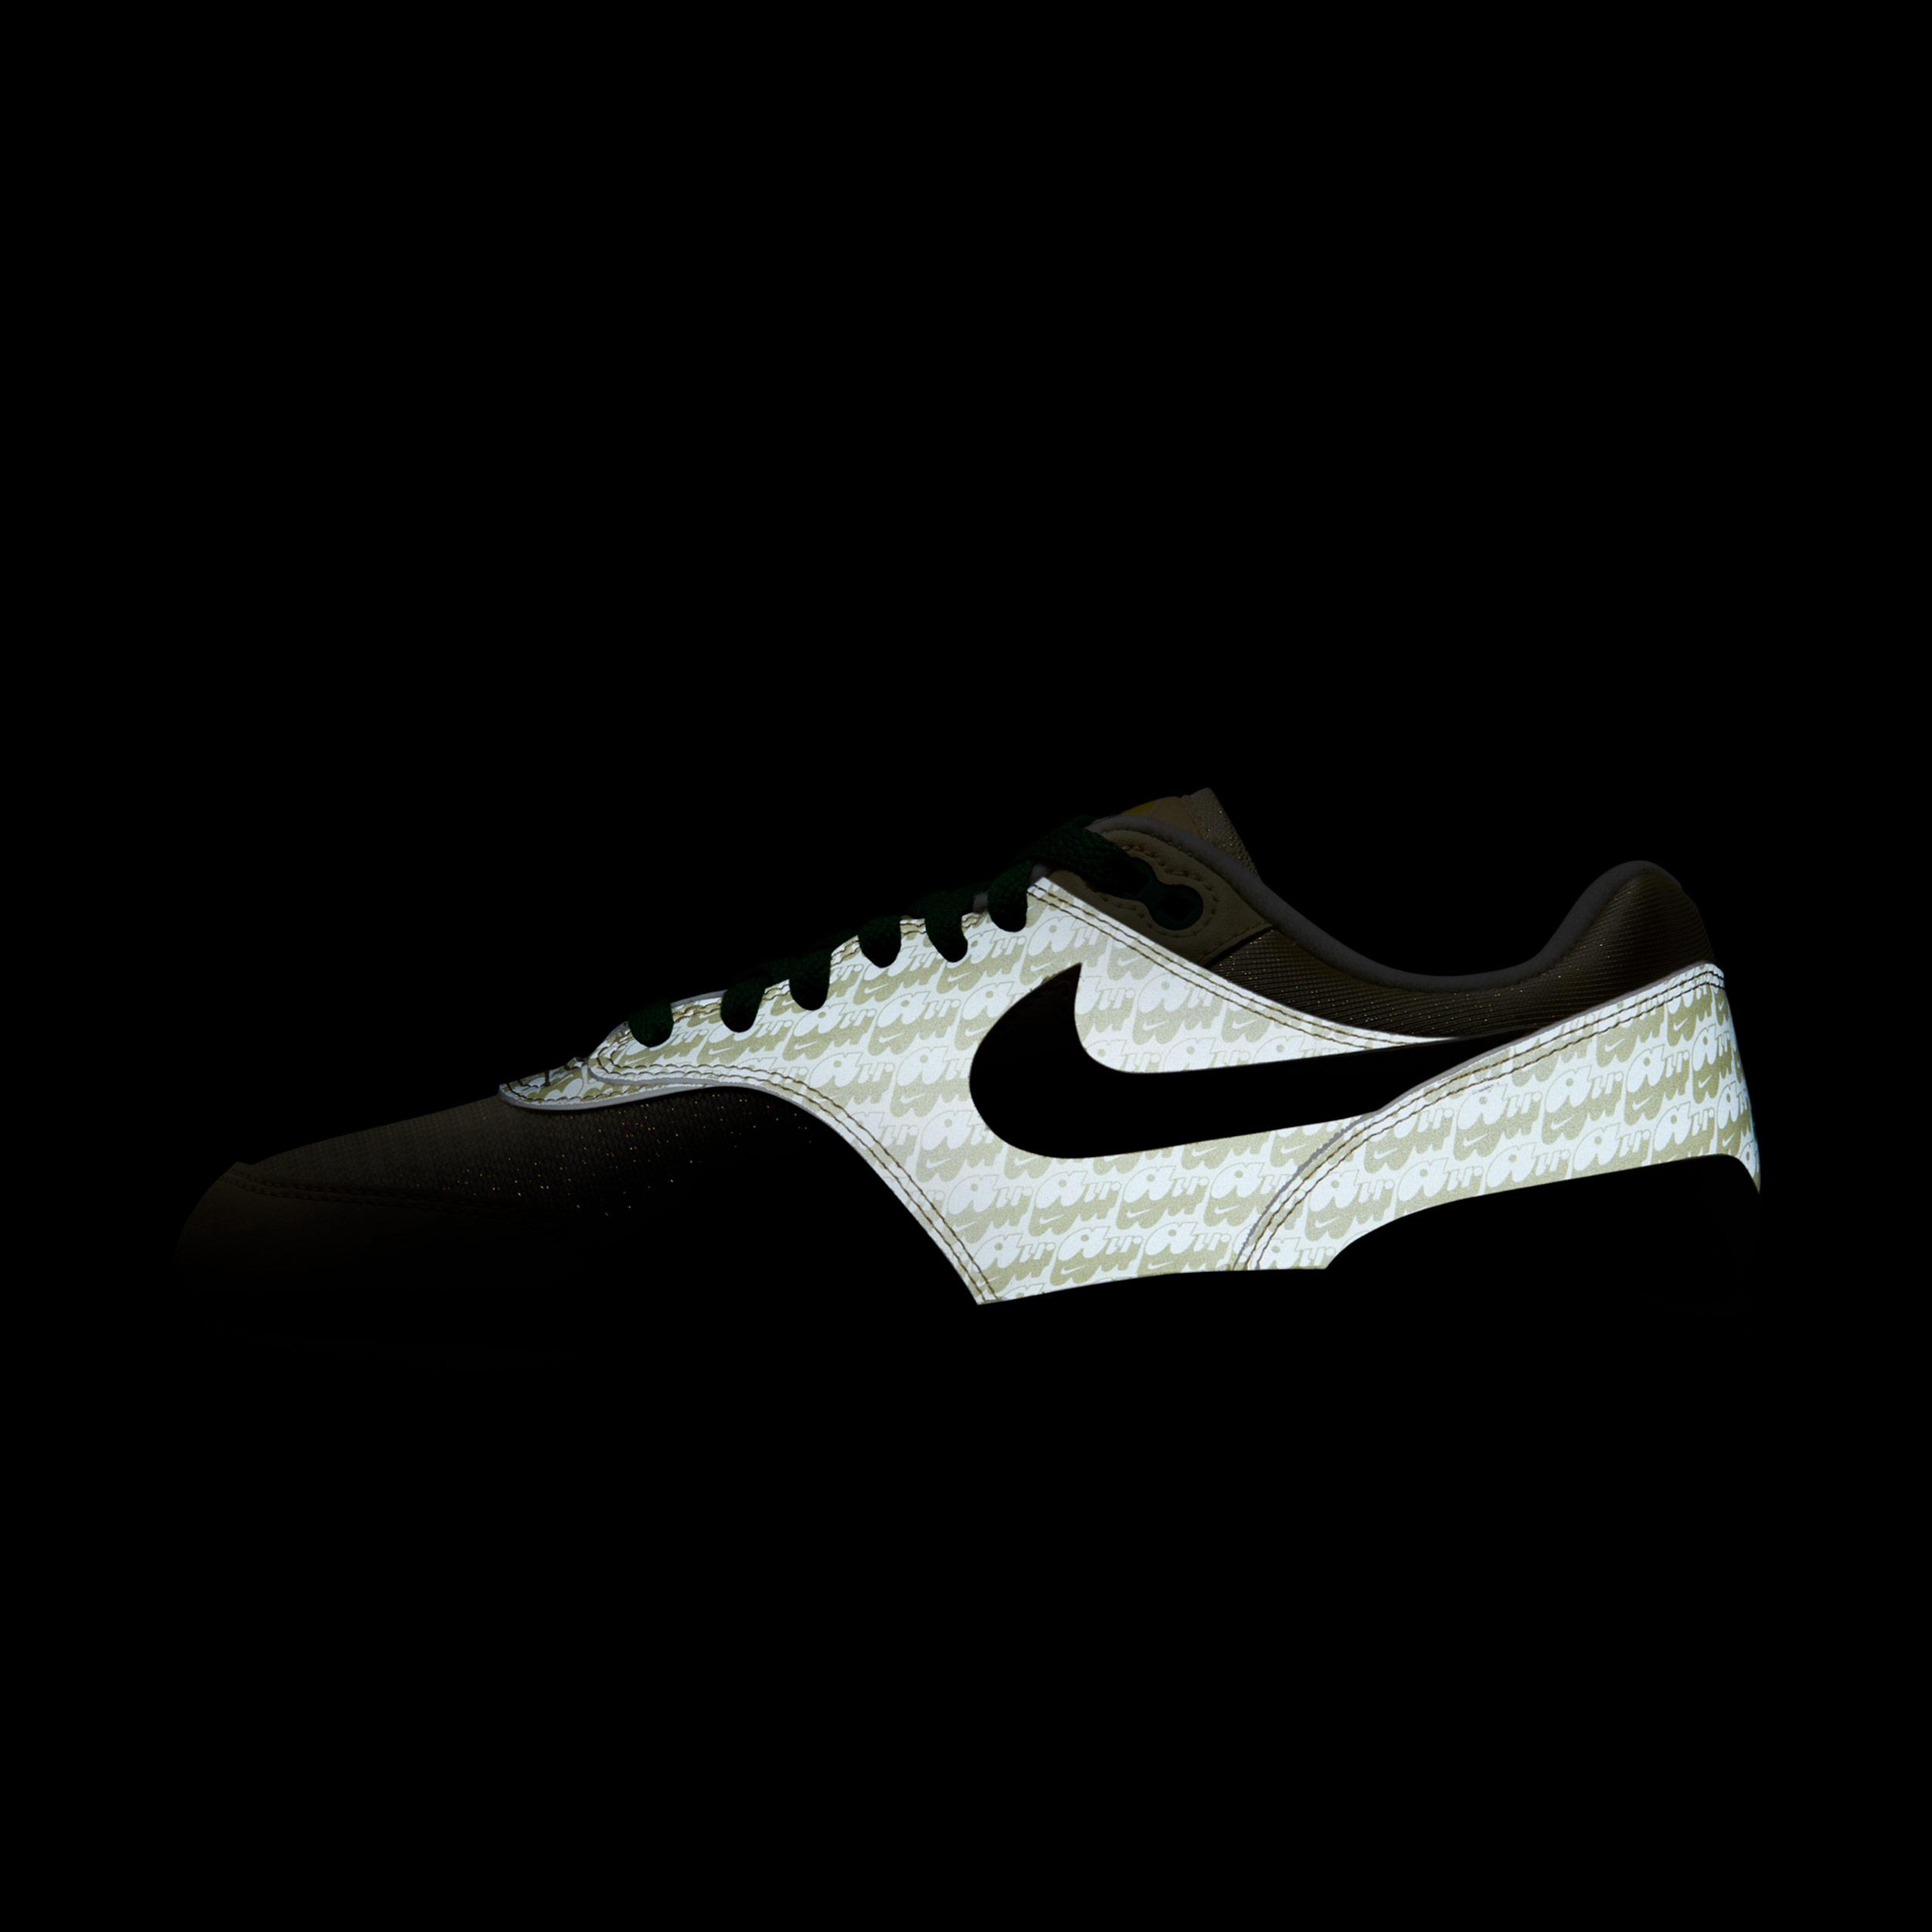 Nike Air Max 1 Prm - Cj0609-700 - SNS   sneakers & streetwear ...